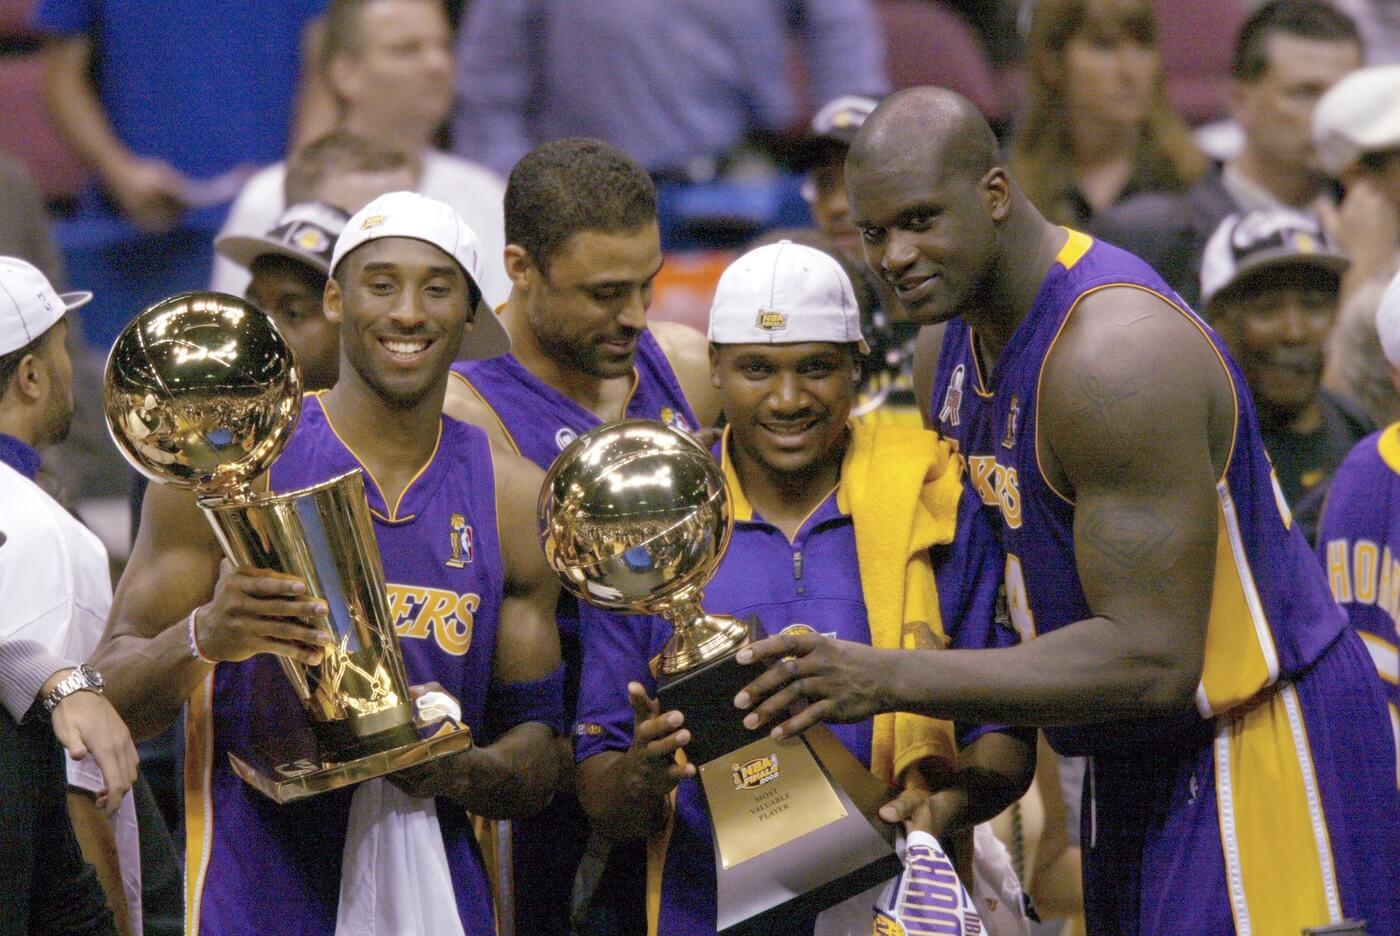 Top 5 Individual Title Runs in NBA History